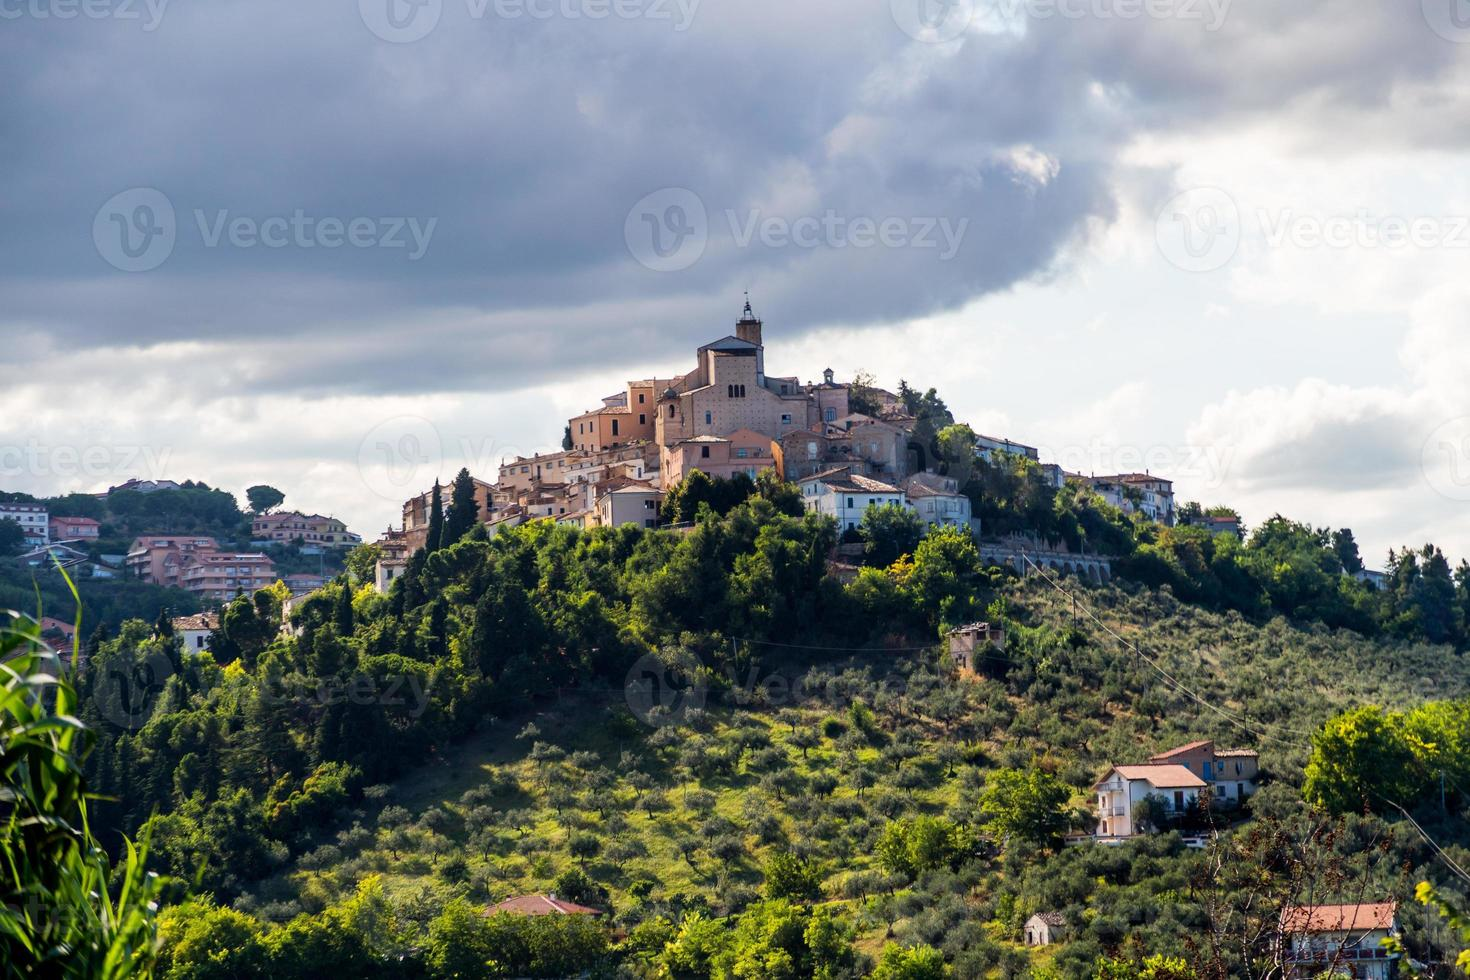 mittelalterliche Stadt Loreto Aprutino, Abruzzen, Italien foto